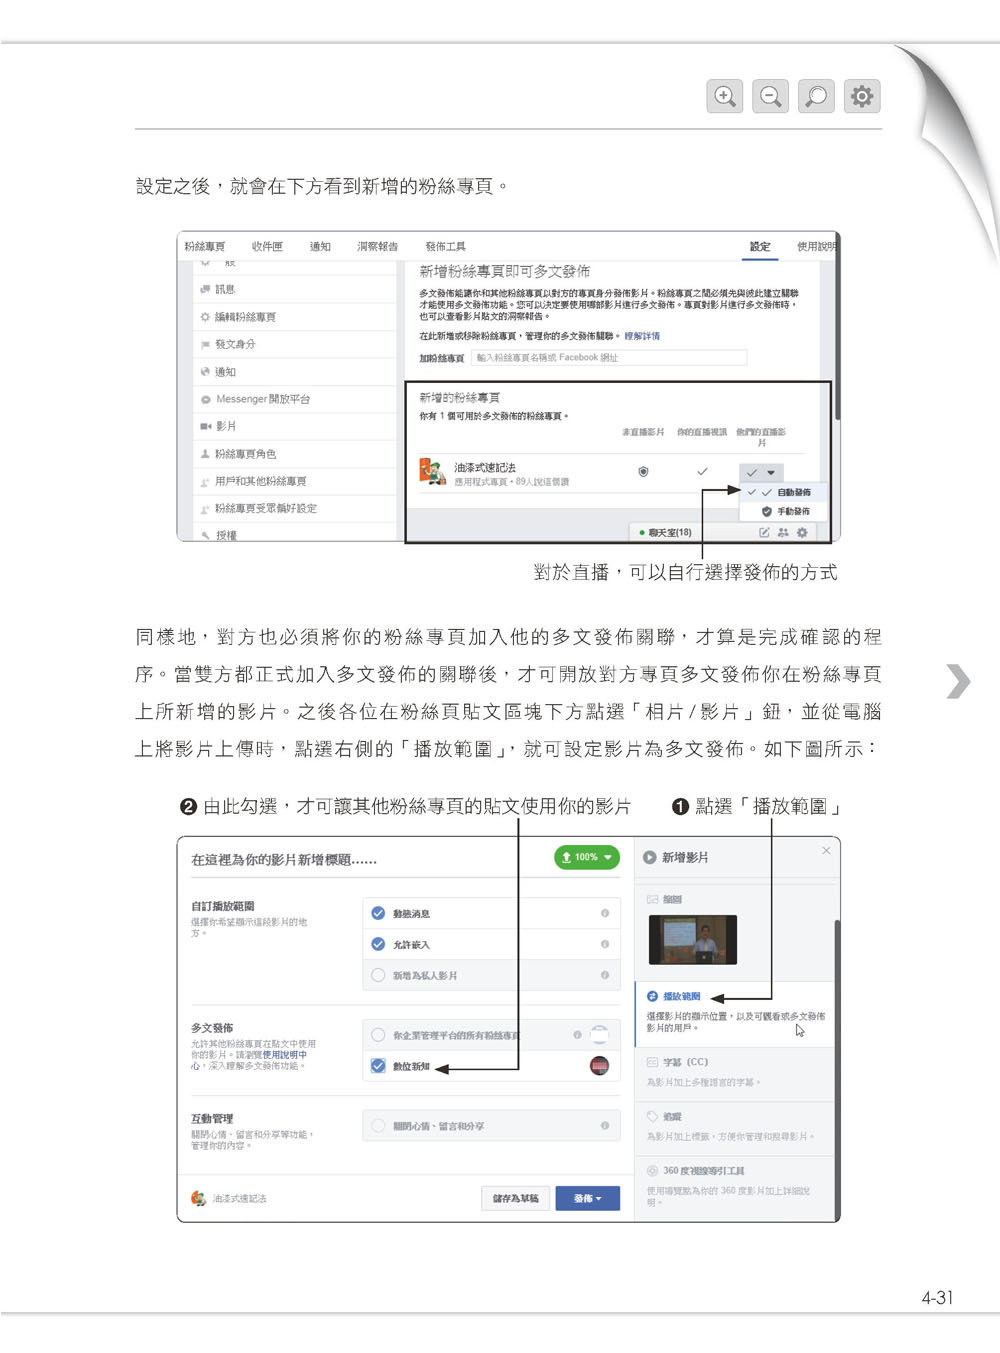 Facebook 互動行銷:社群口碑經營新思路+廣告投放如何有成效,想做好臉書行銷,操作心法就在這!-preview-7